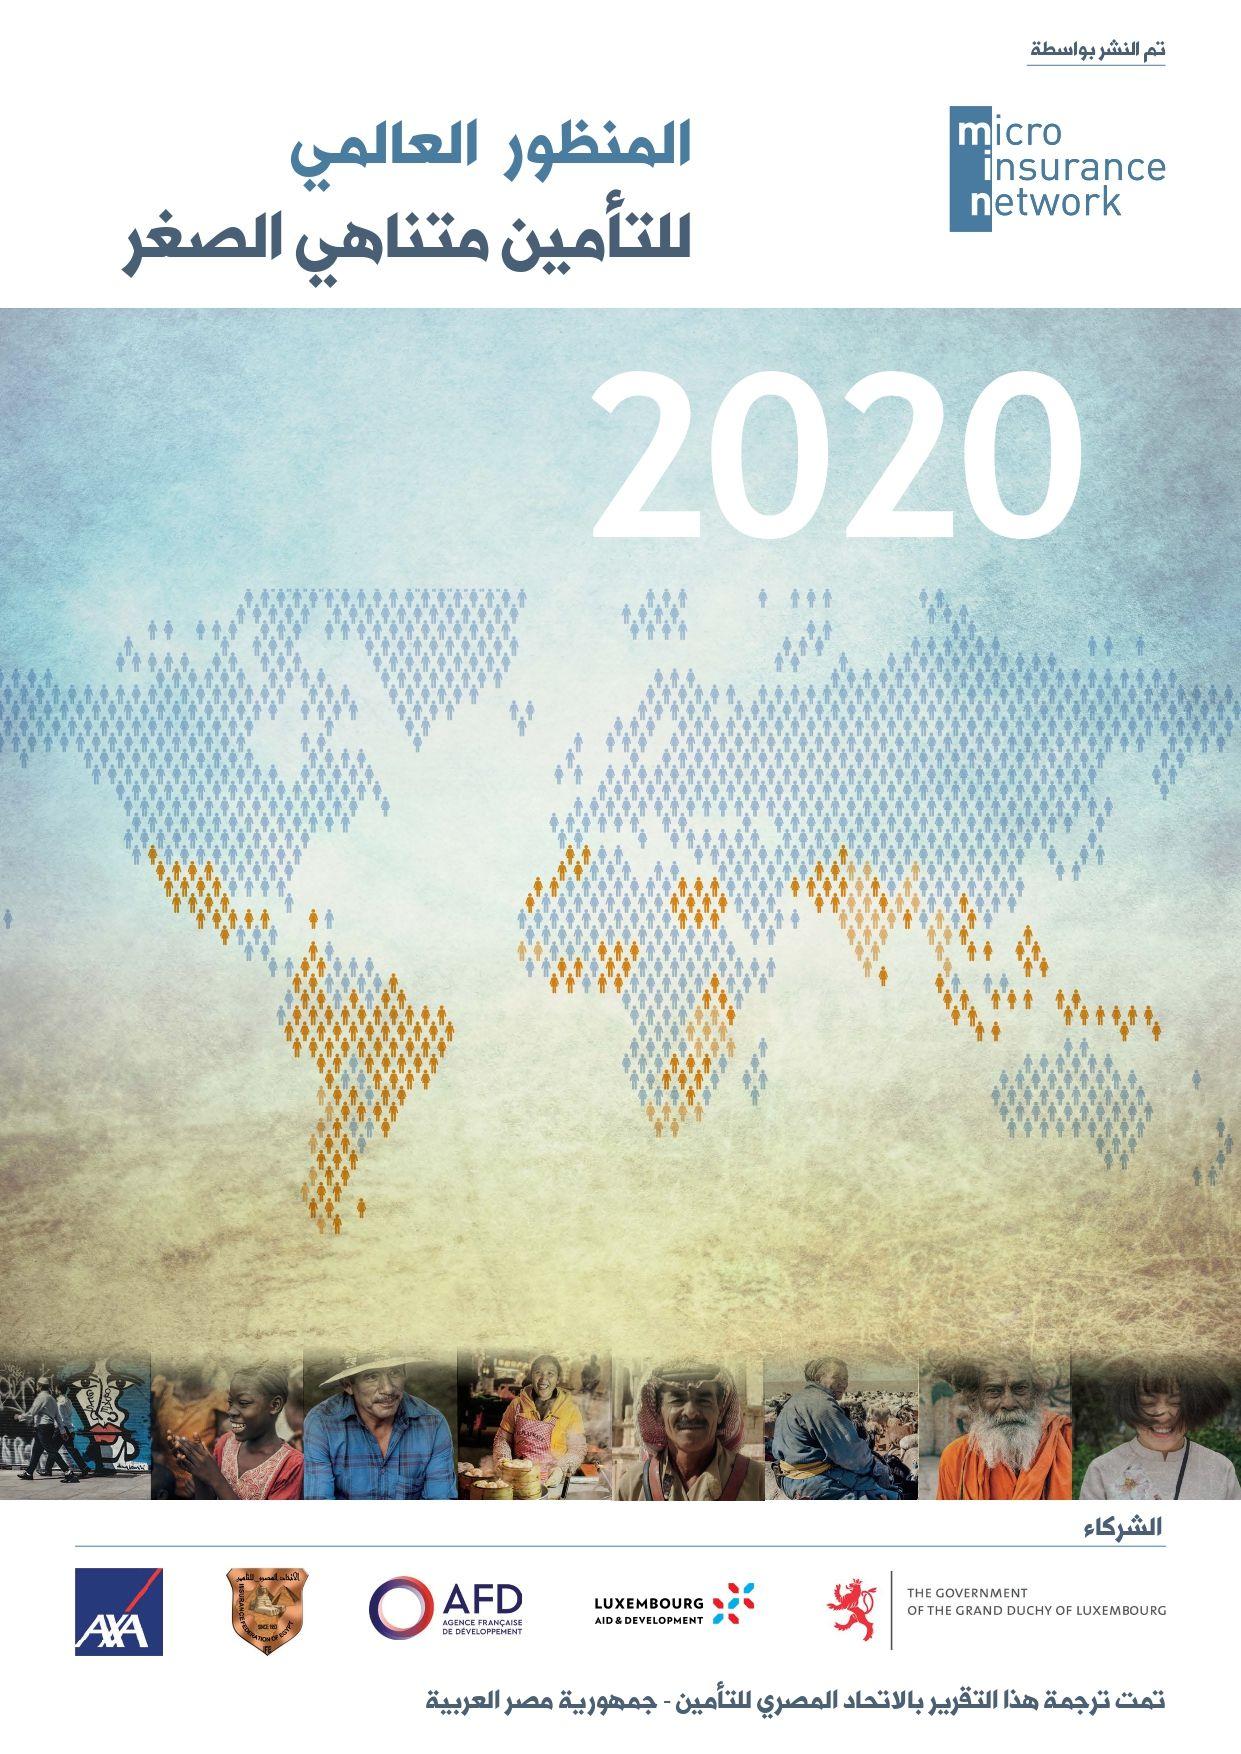 MiN-Landscape-2020-ARABIC_vf-1 (1)_page-0001.jpg